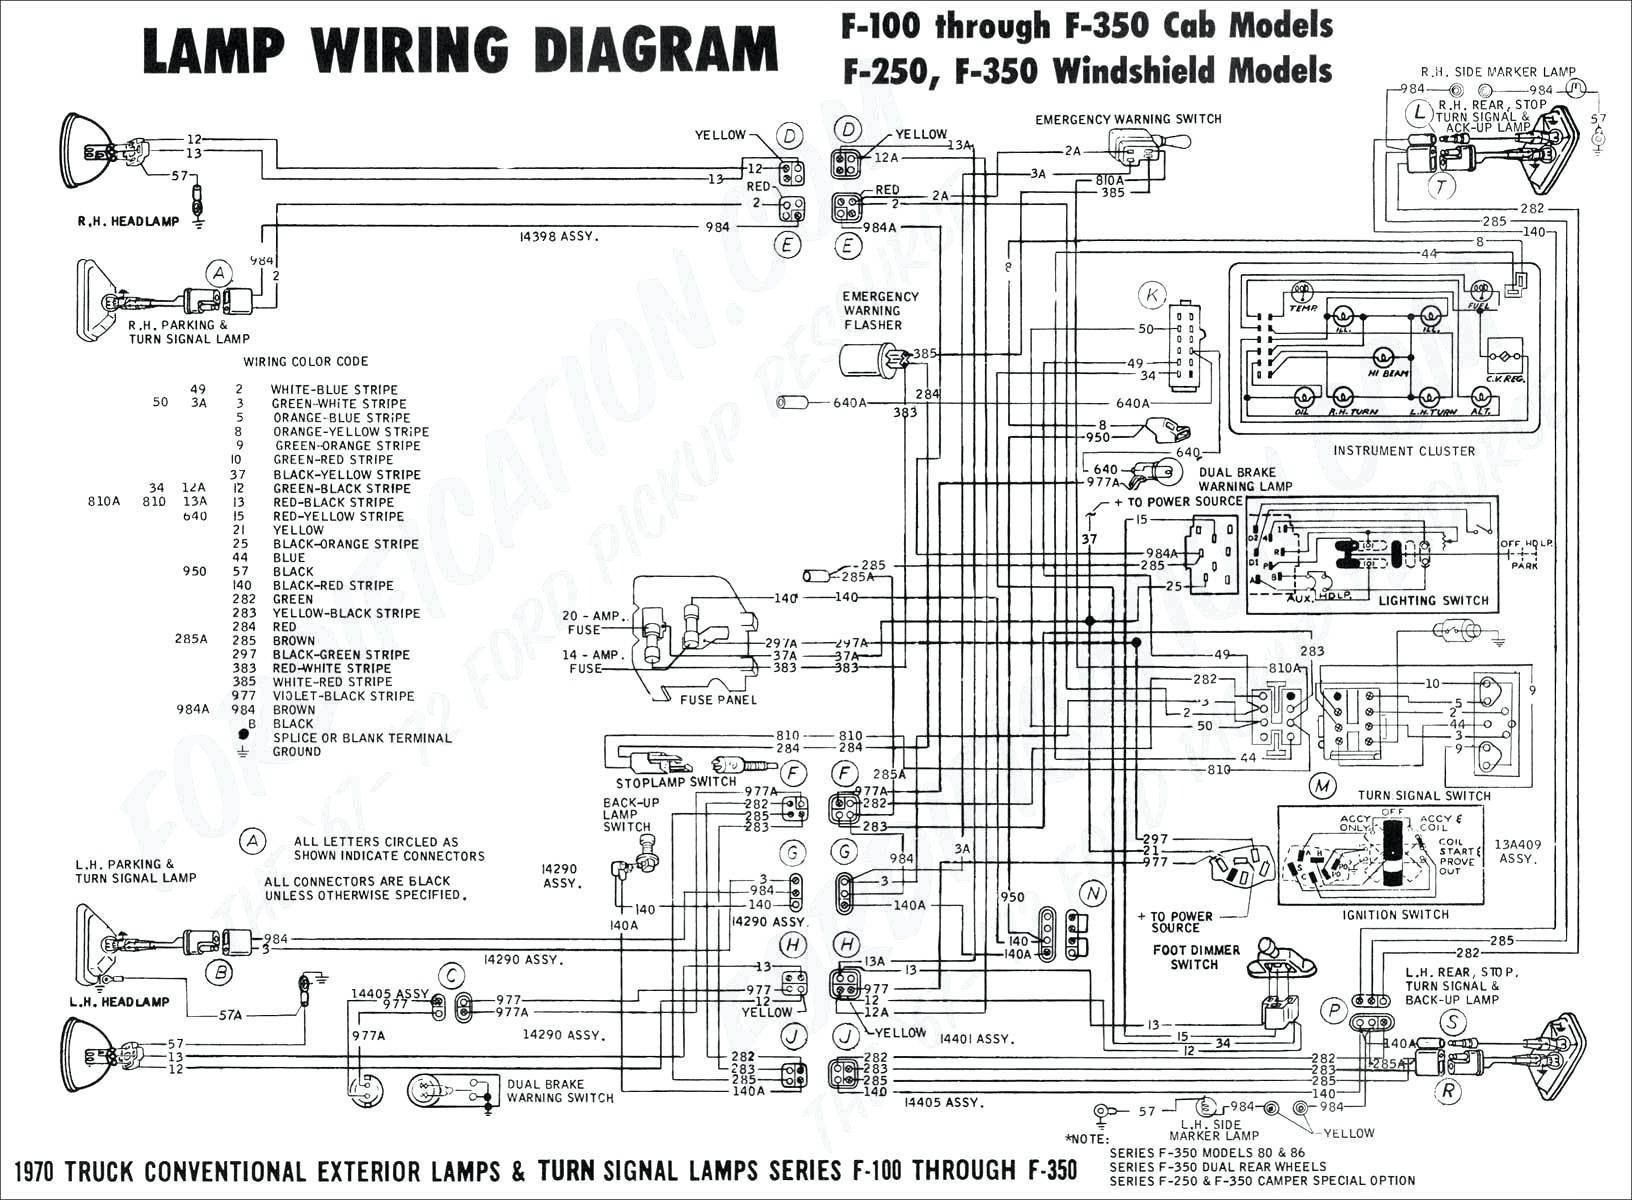 Bottom Of Car Diagram Wiring Diagram Car Ac Best 2004 Silverado Ac Schematic Schematics Of Bottom Of Car Diagram